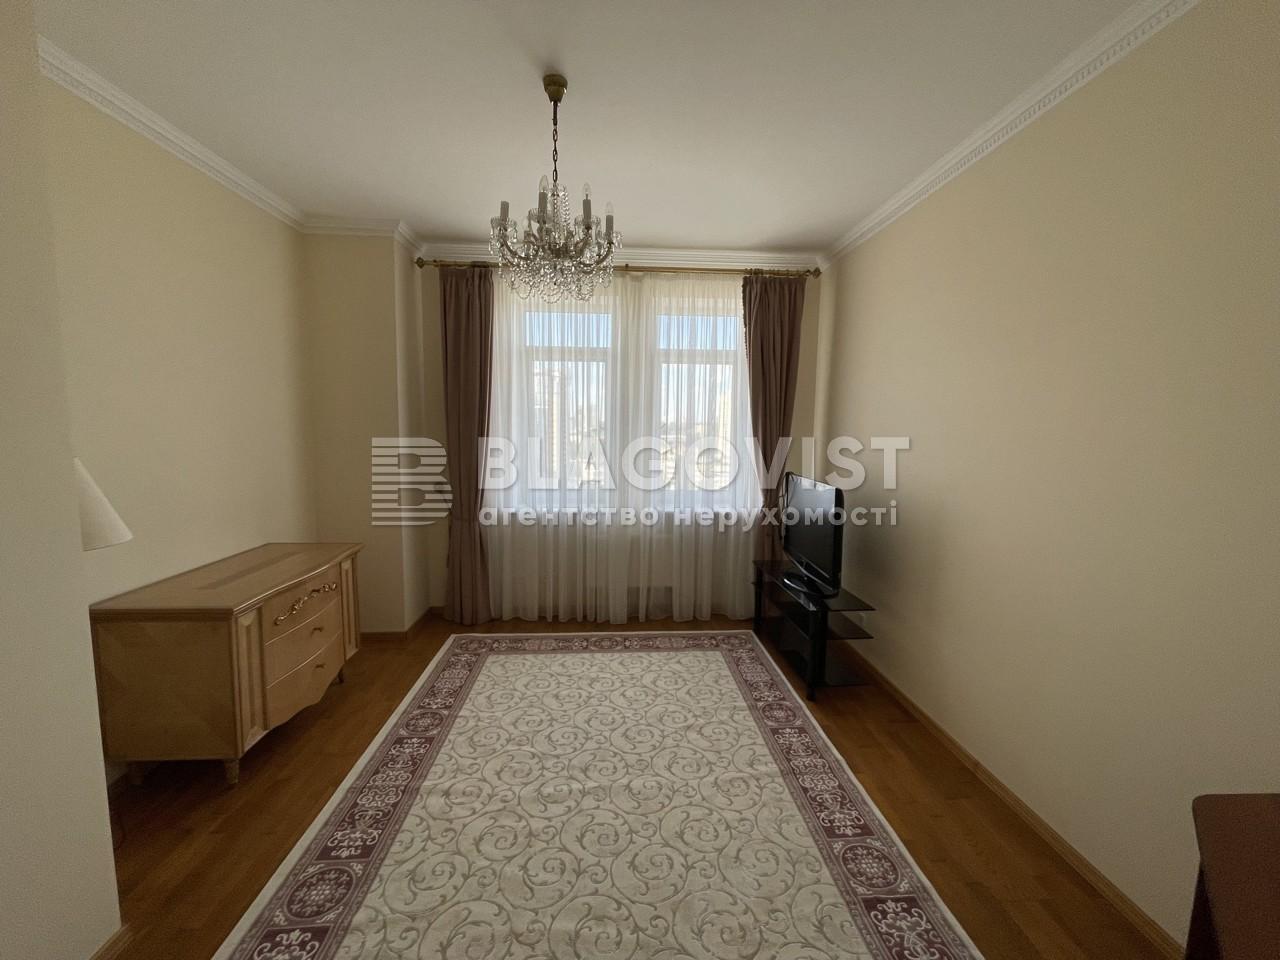 Квартира Z-803905, Провиантская (Тимофеевой Гали), 3, Киев - Фото 5